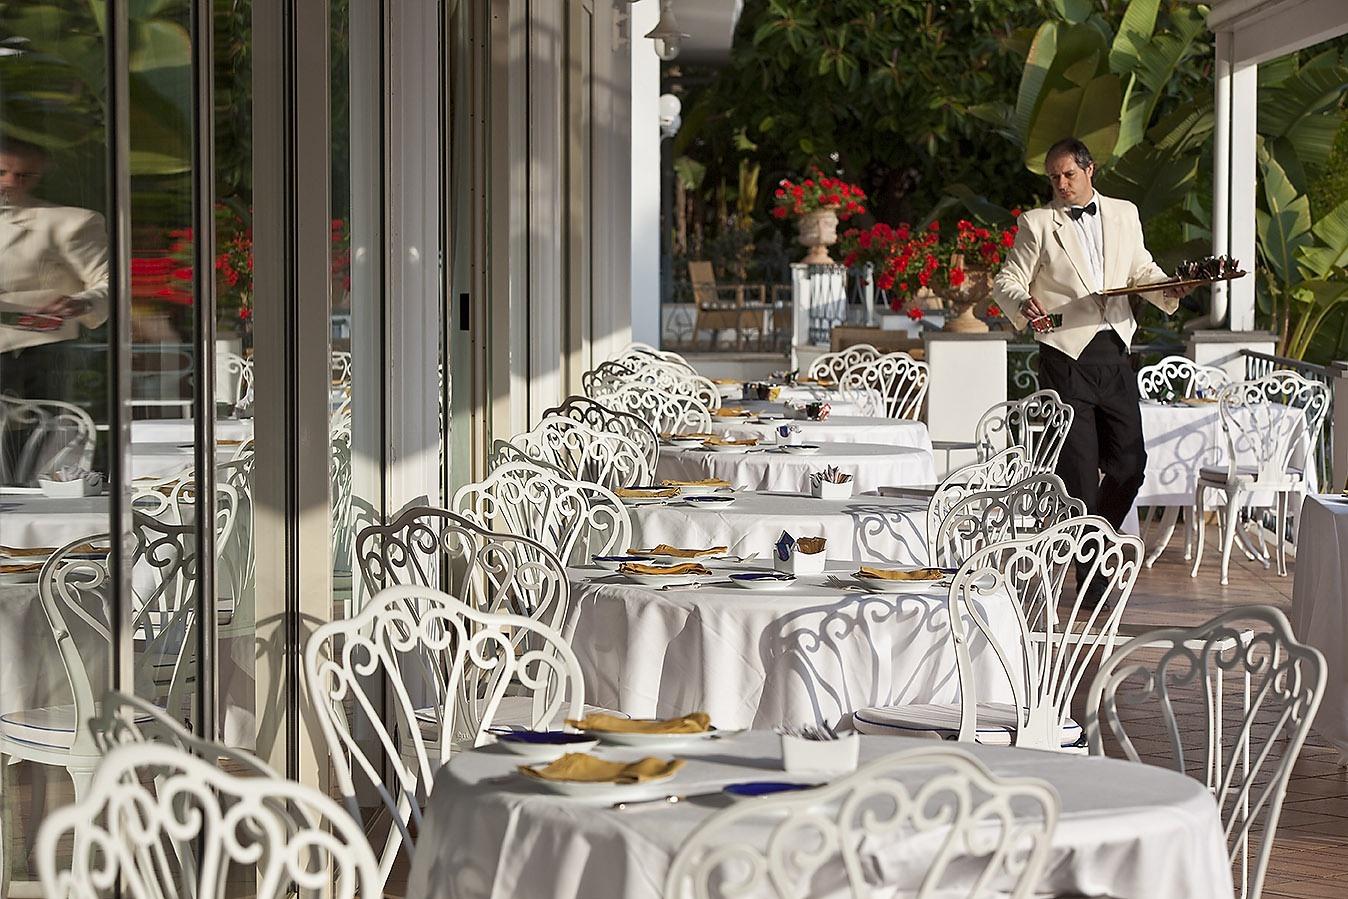 Tavoli ristorante all'aperto